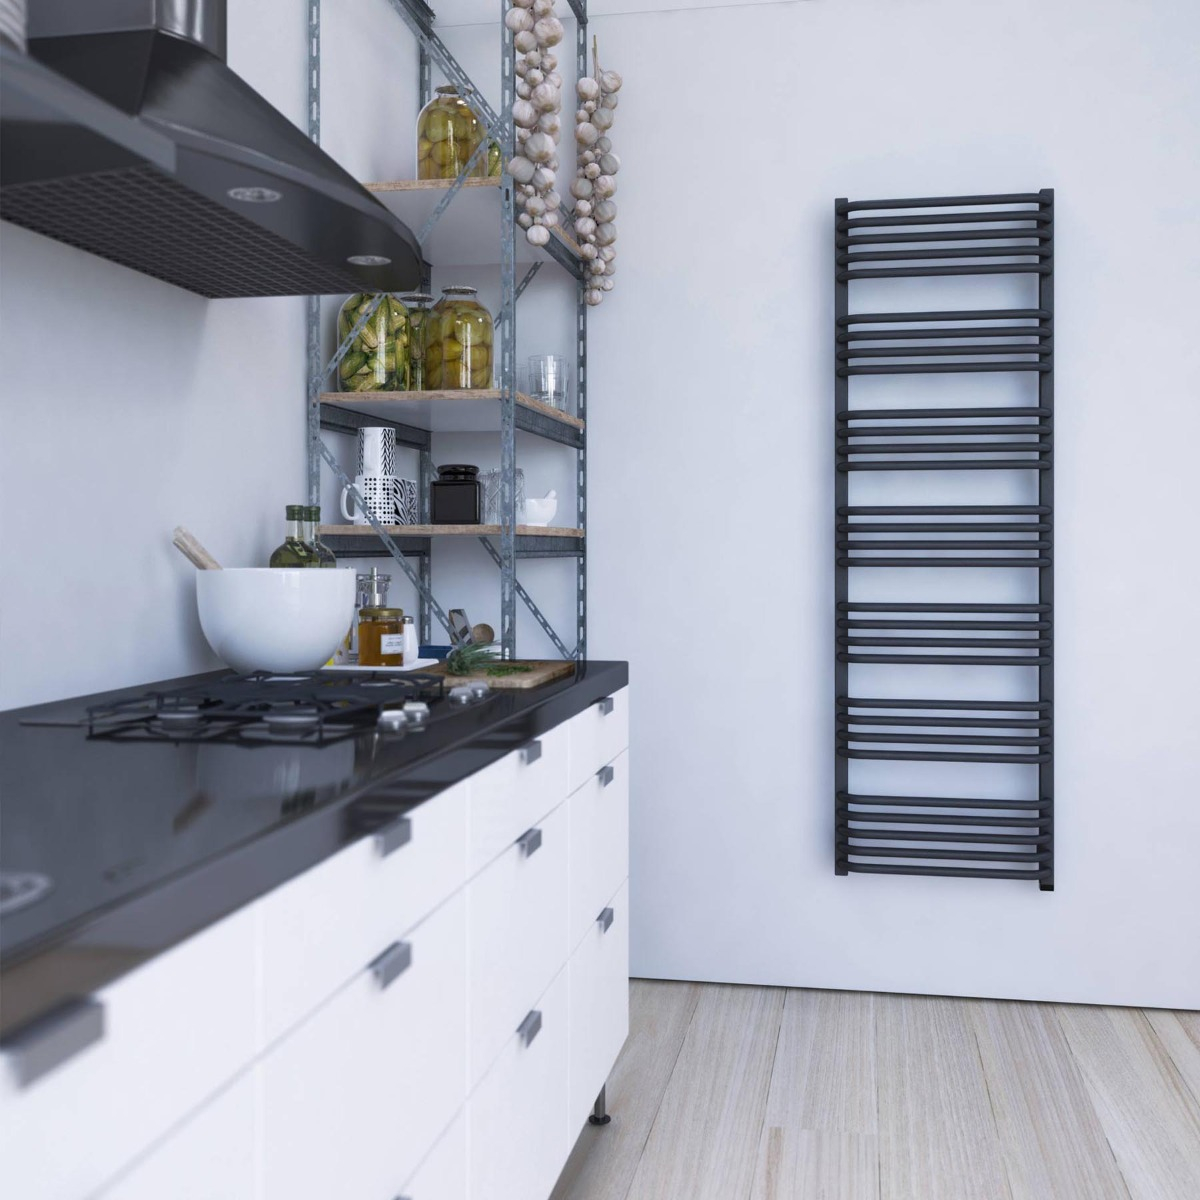 Towel rail in kitchen